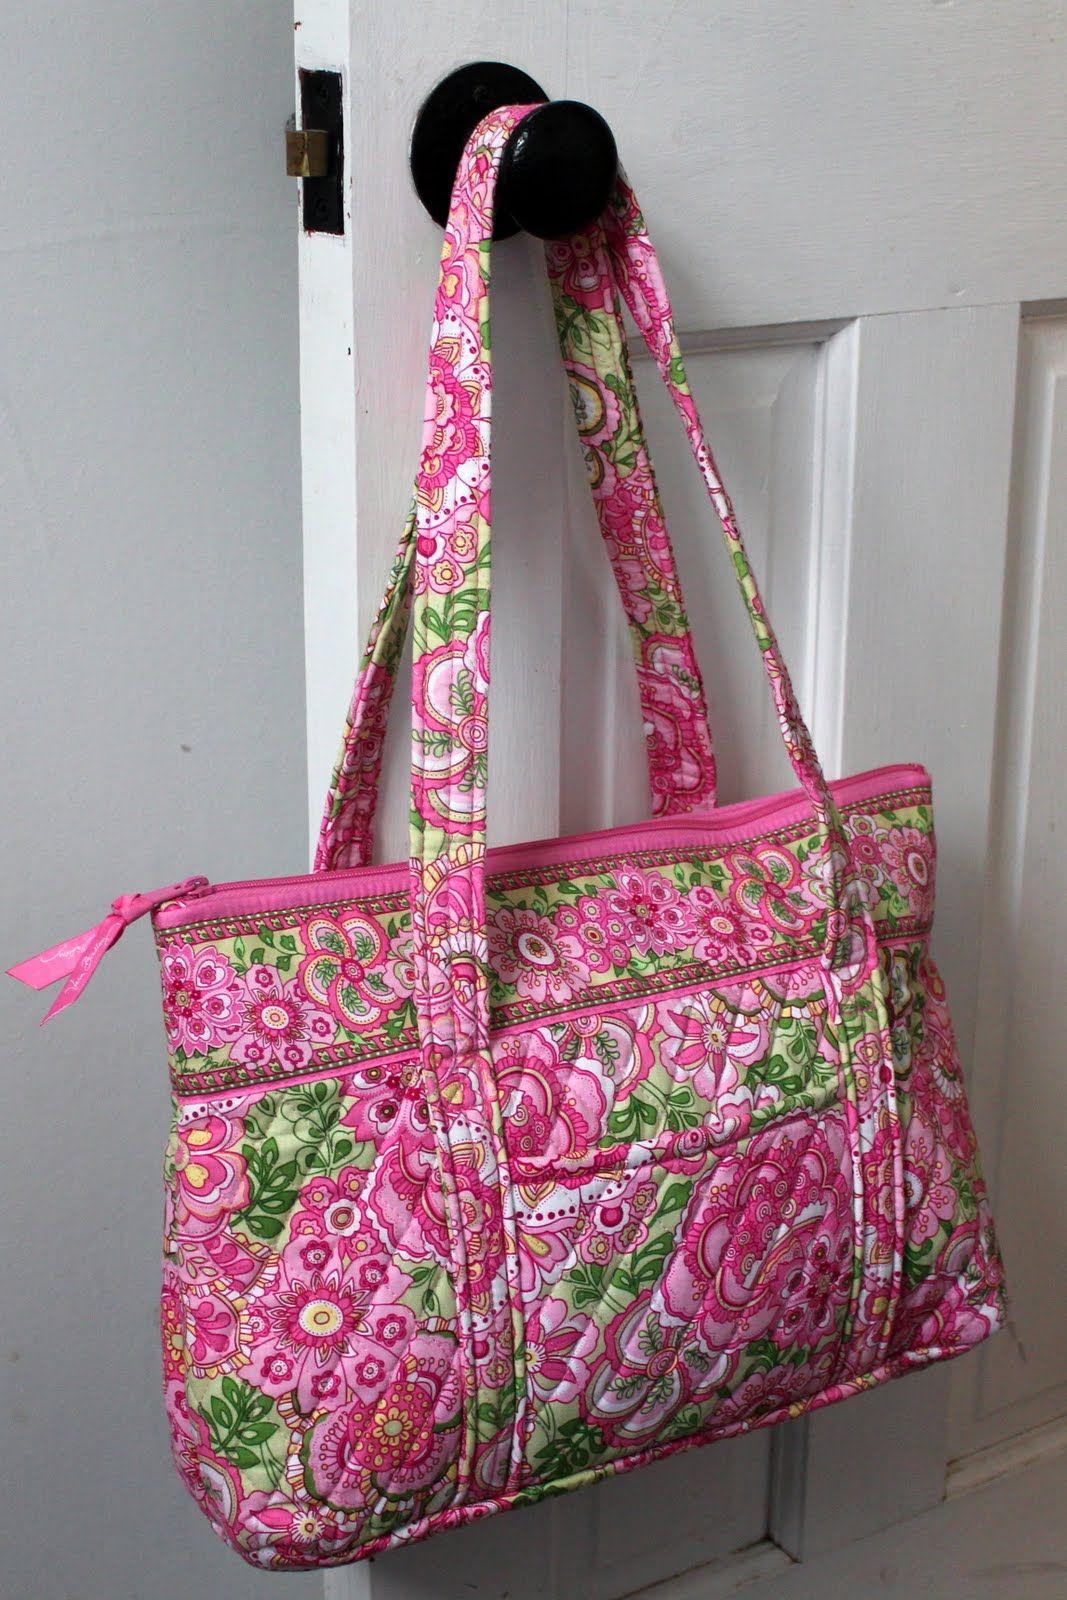 cef5a89706ab my old vera bradley pattern! I love this